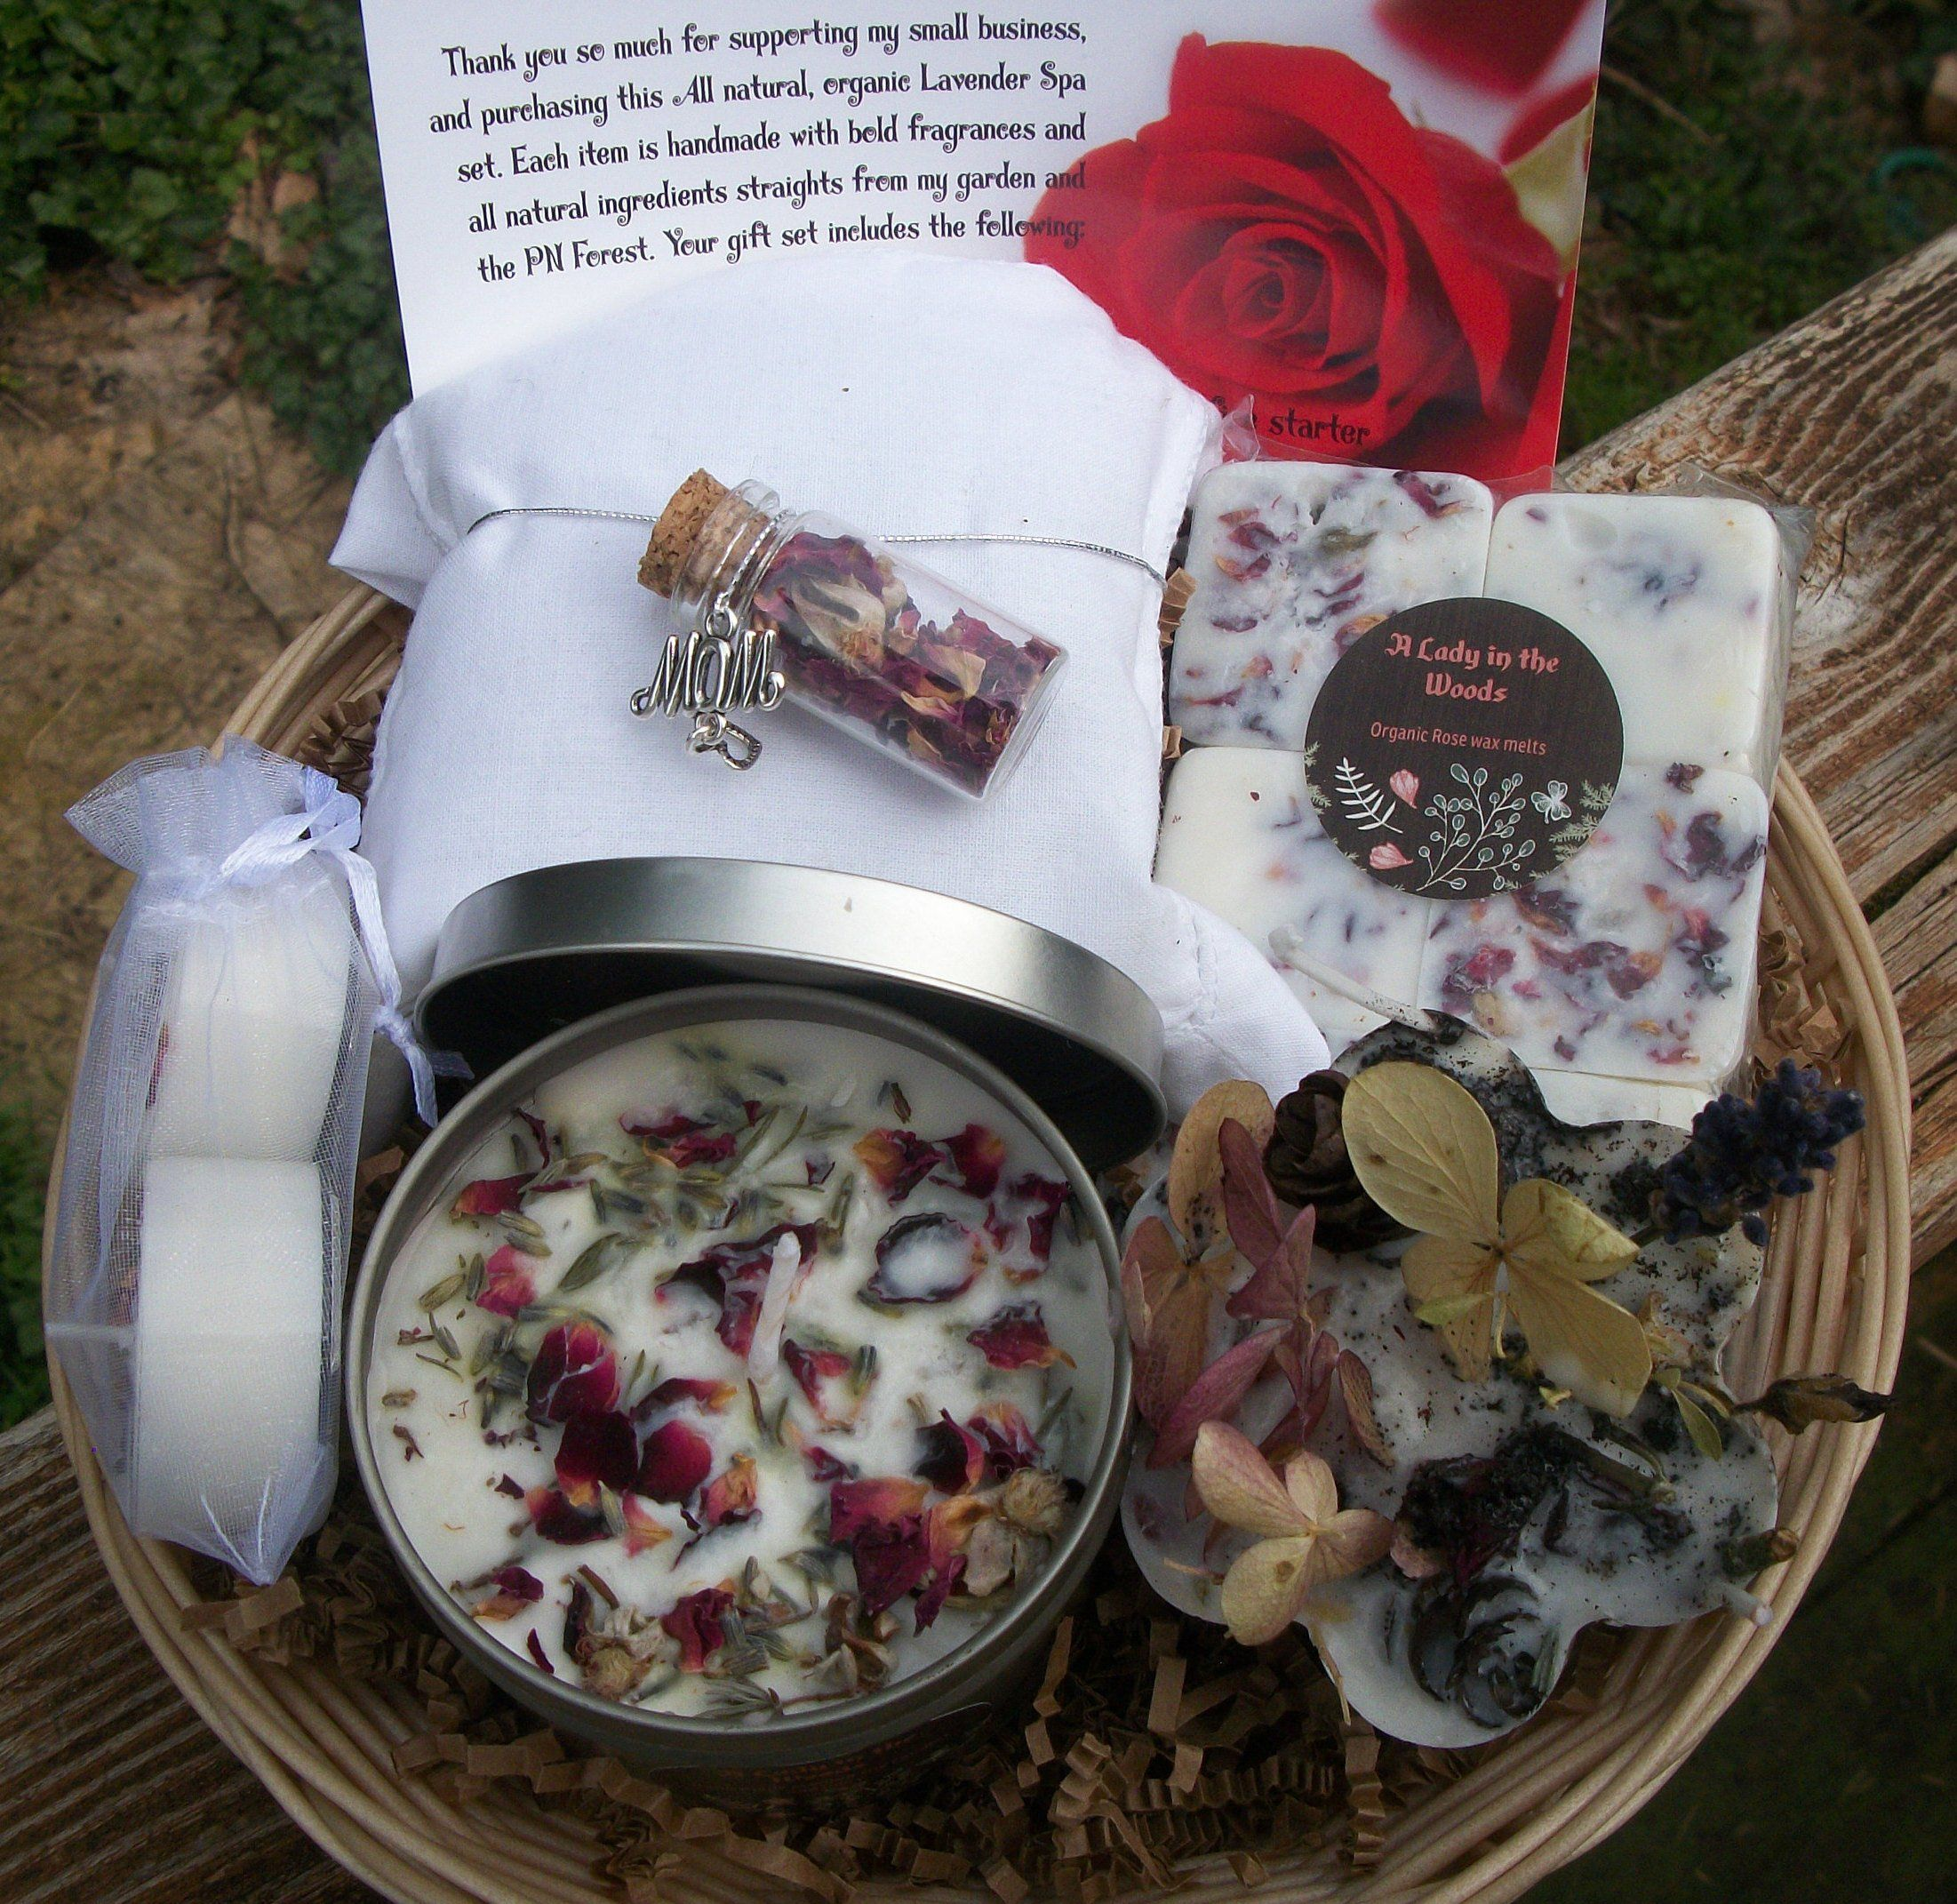 Rose bridesmaid gift set - bride gift - Maid of honor gift